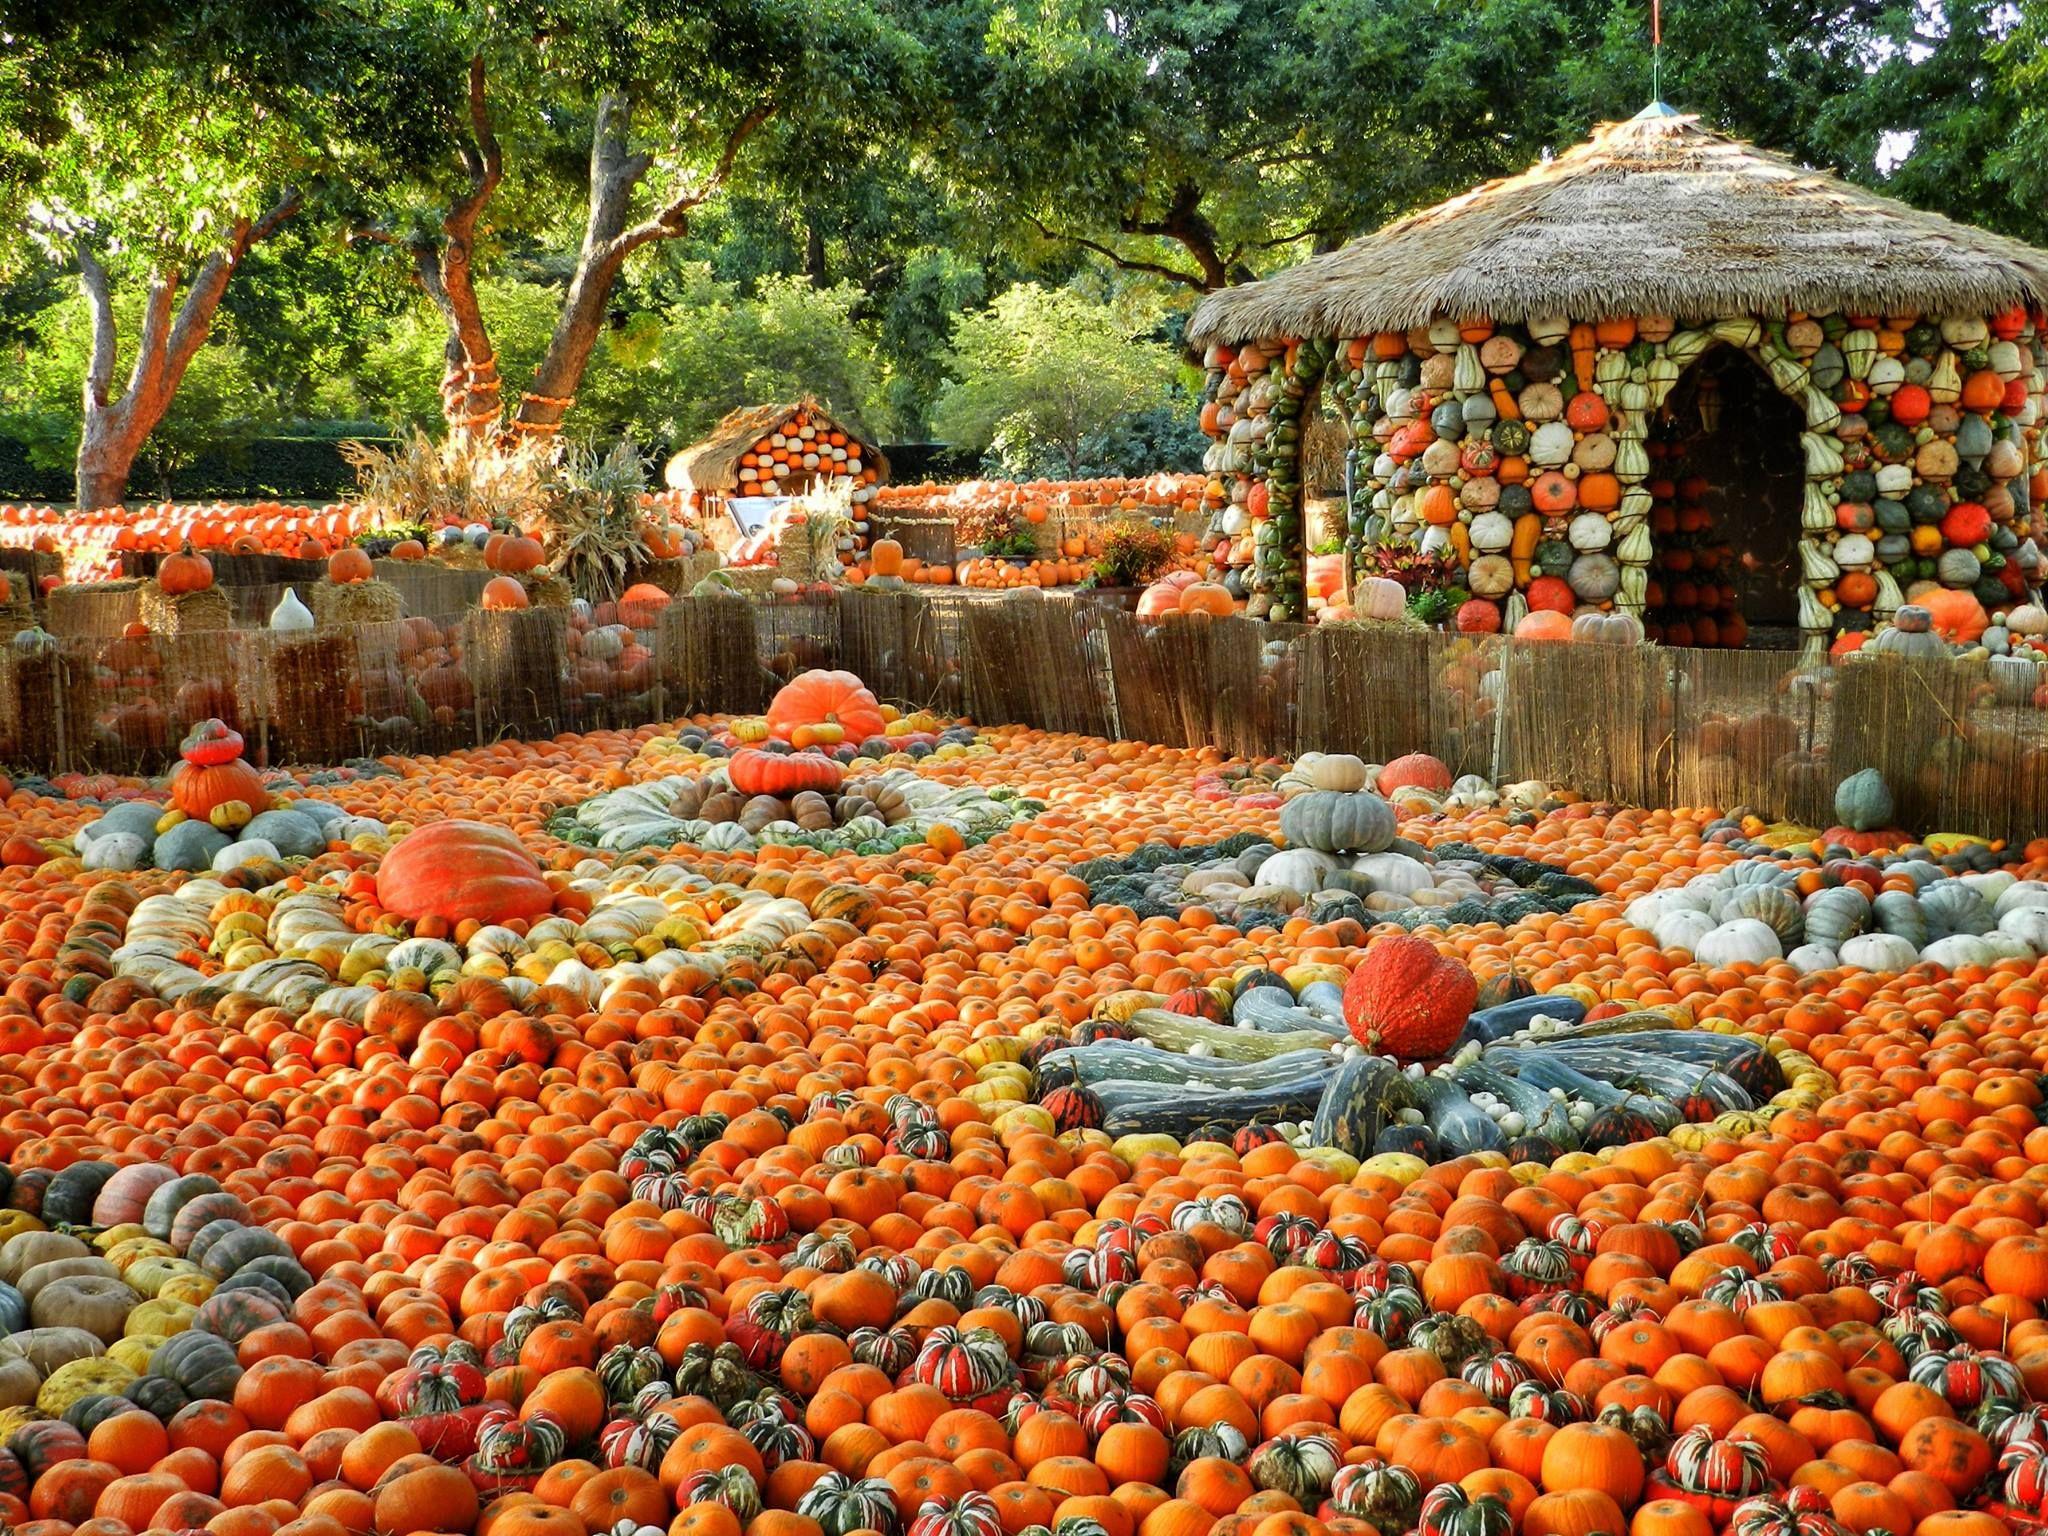 Dallas Arboretum and Botanical Garden.....wow | Fαℓℓ ínto ᎯUTUMN ...